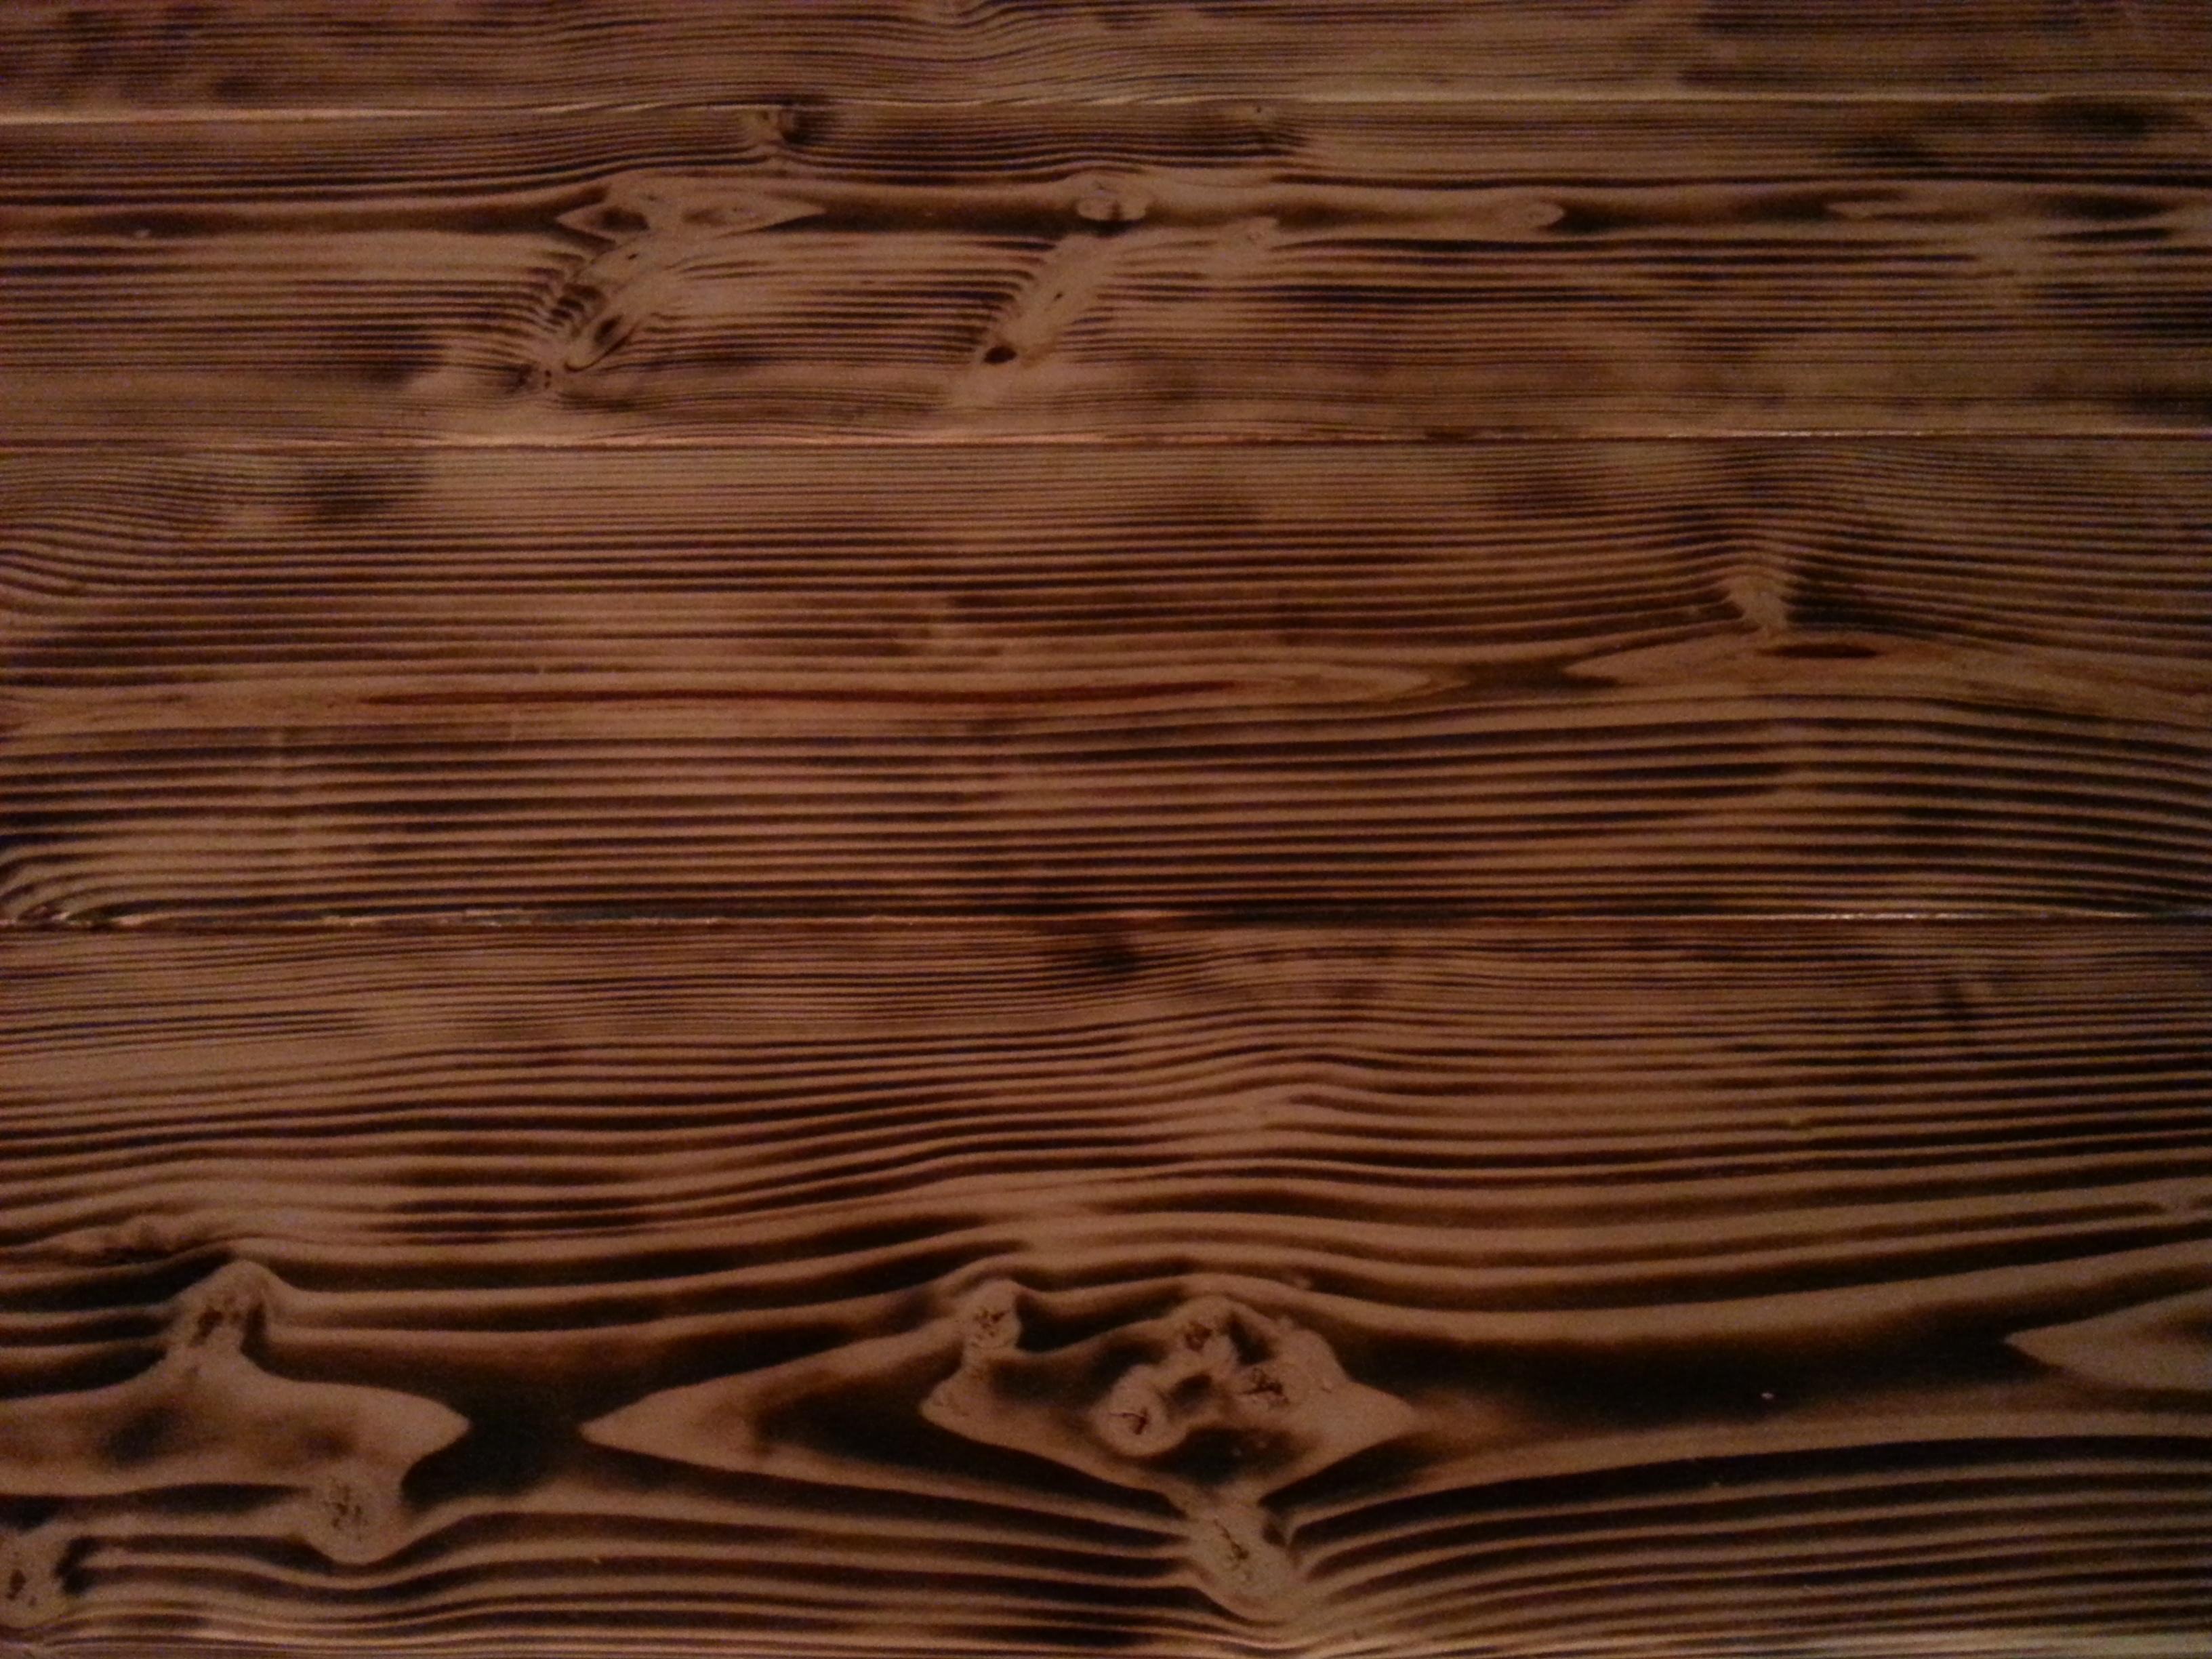 digital designs  original photography - close up of wood grain